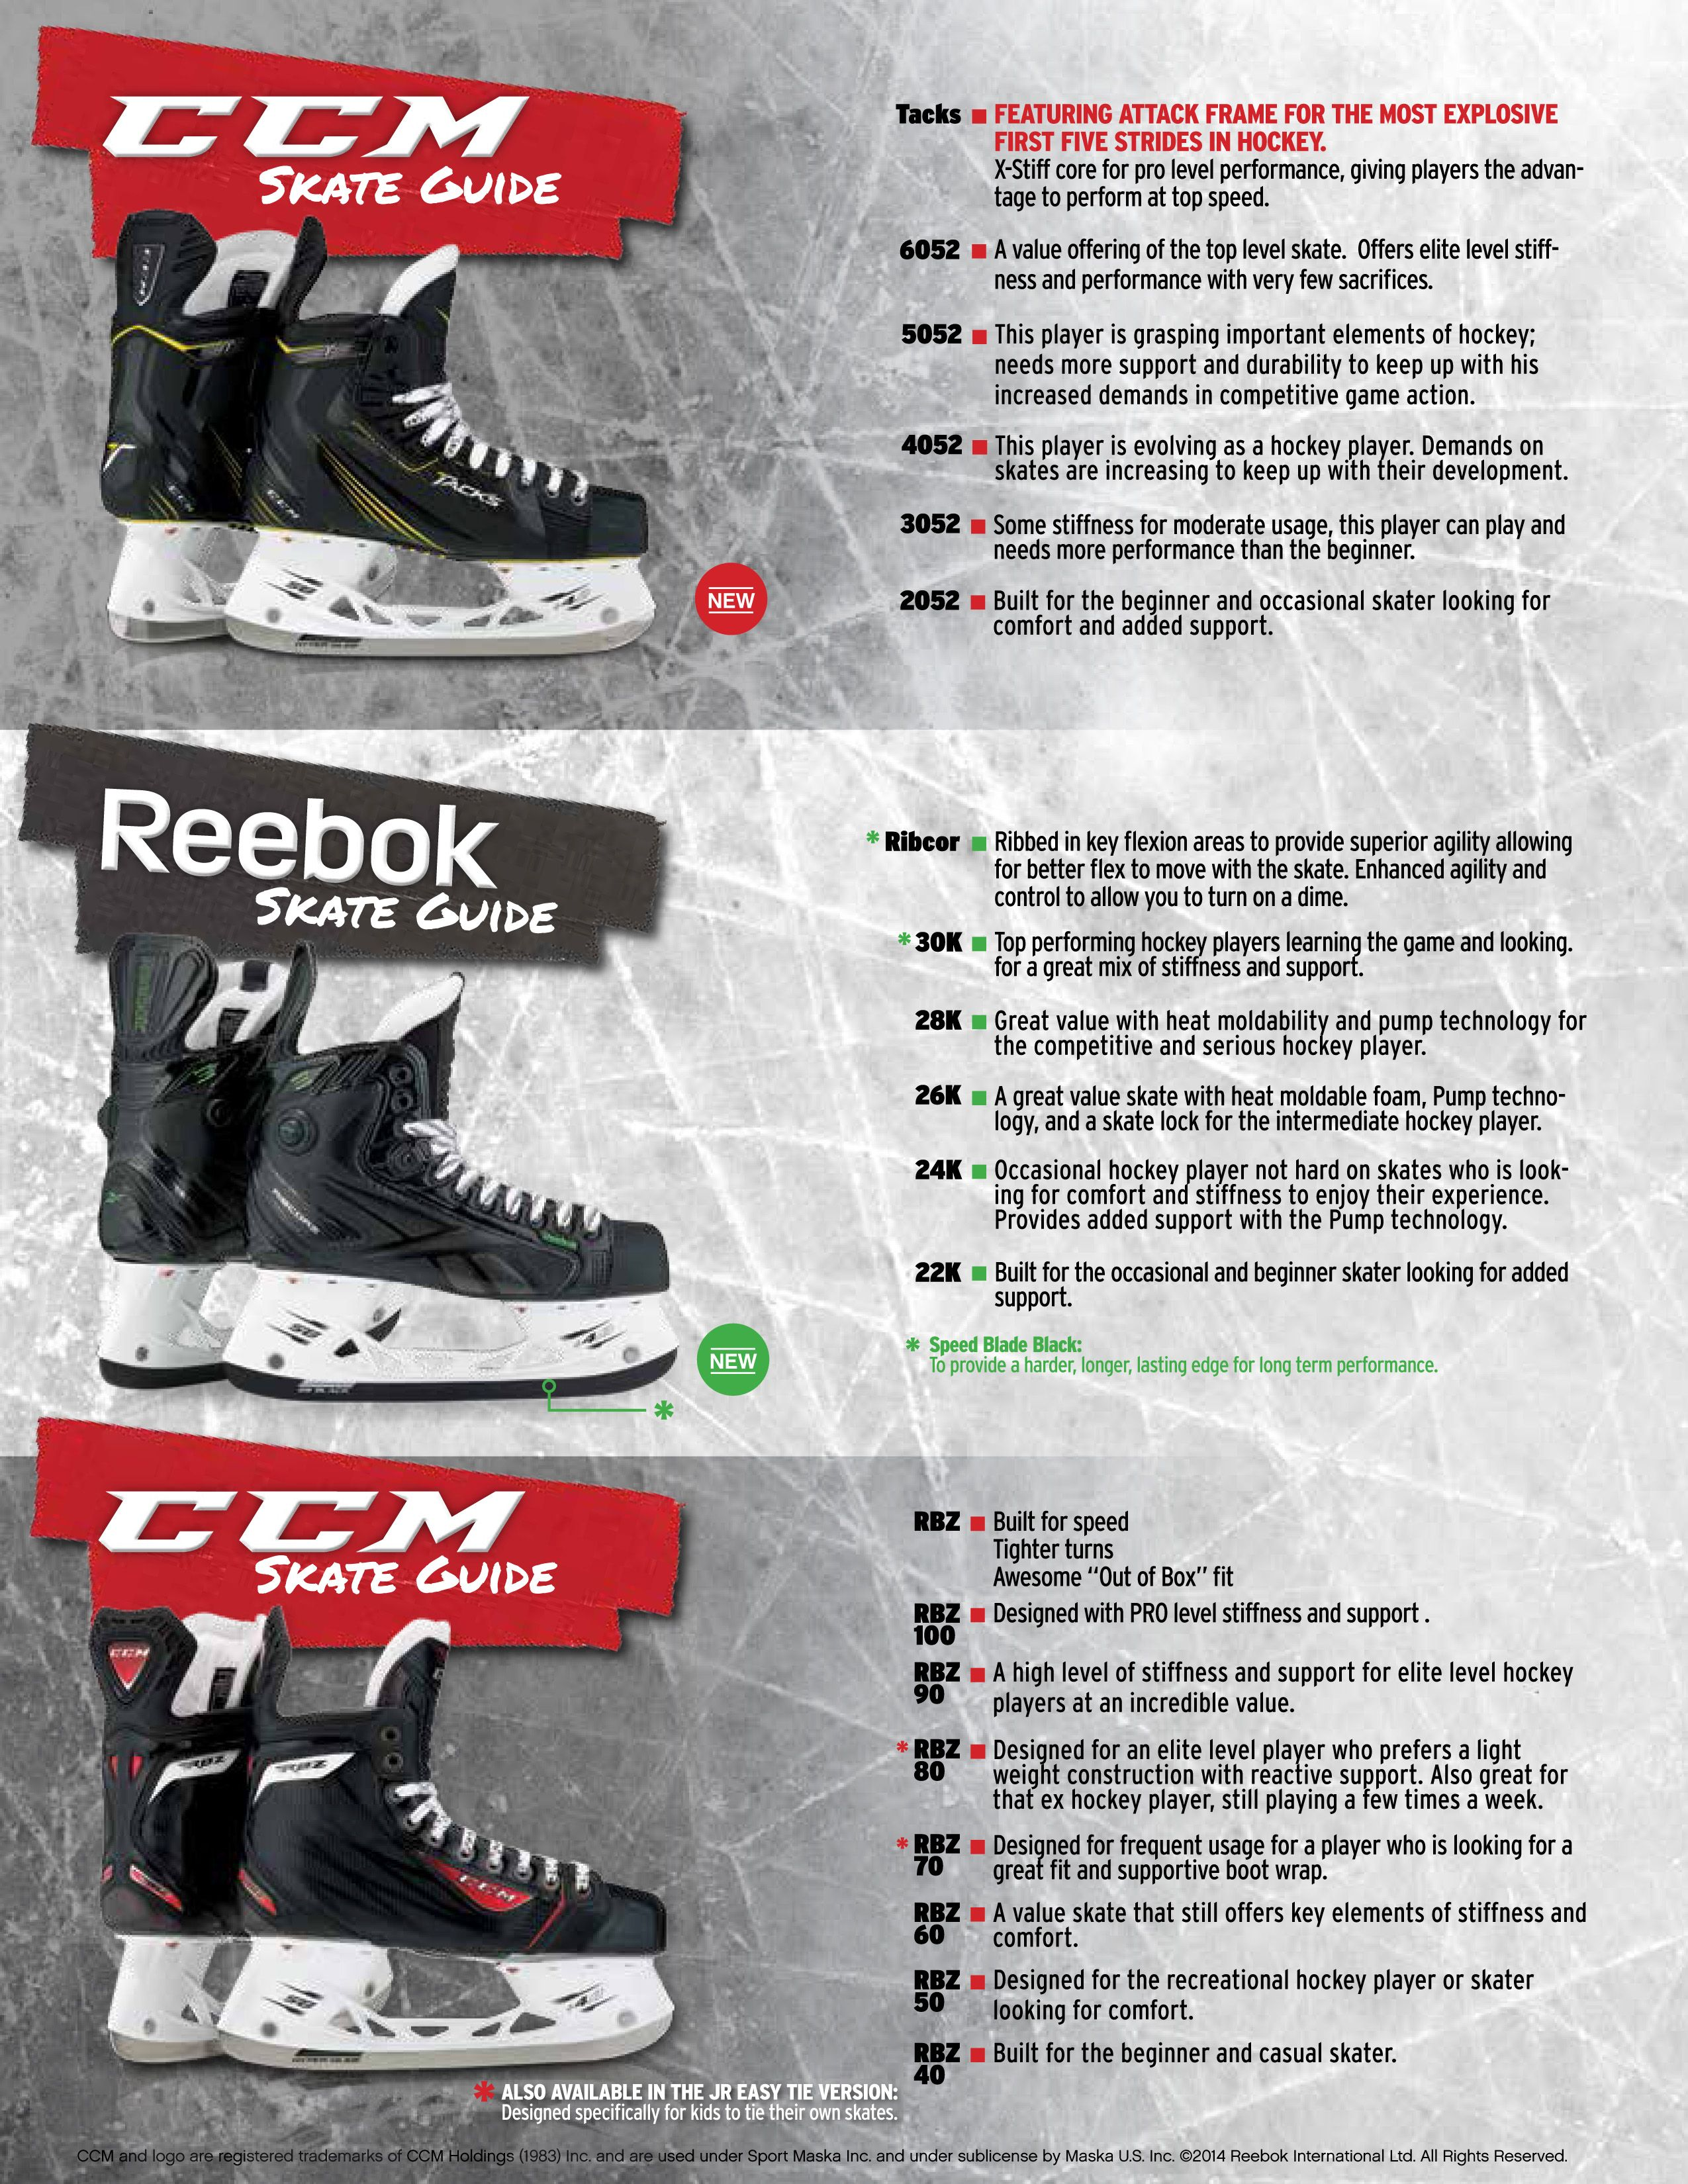 Tacks Rbz Or Ribcor The Following Skate Guide Will Help You Make The Good Choice For You Shop Skates Http Www Prohockey Hockey Hockey Gear Ice Hockey